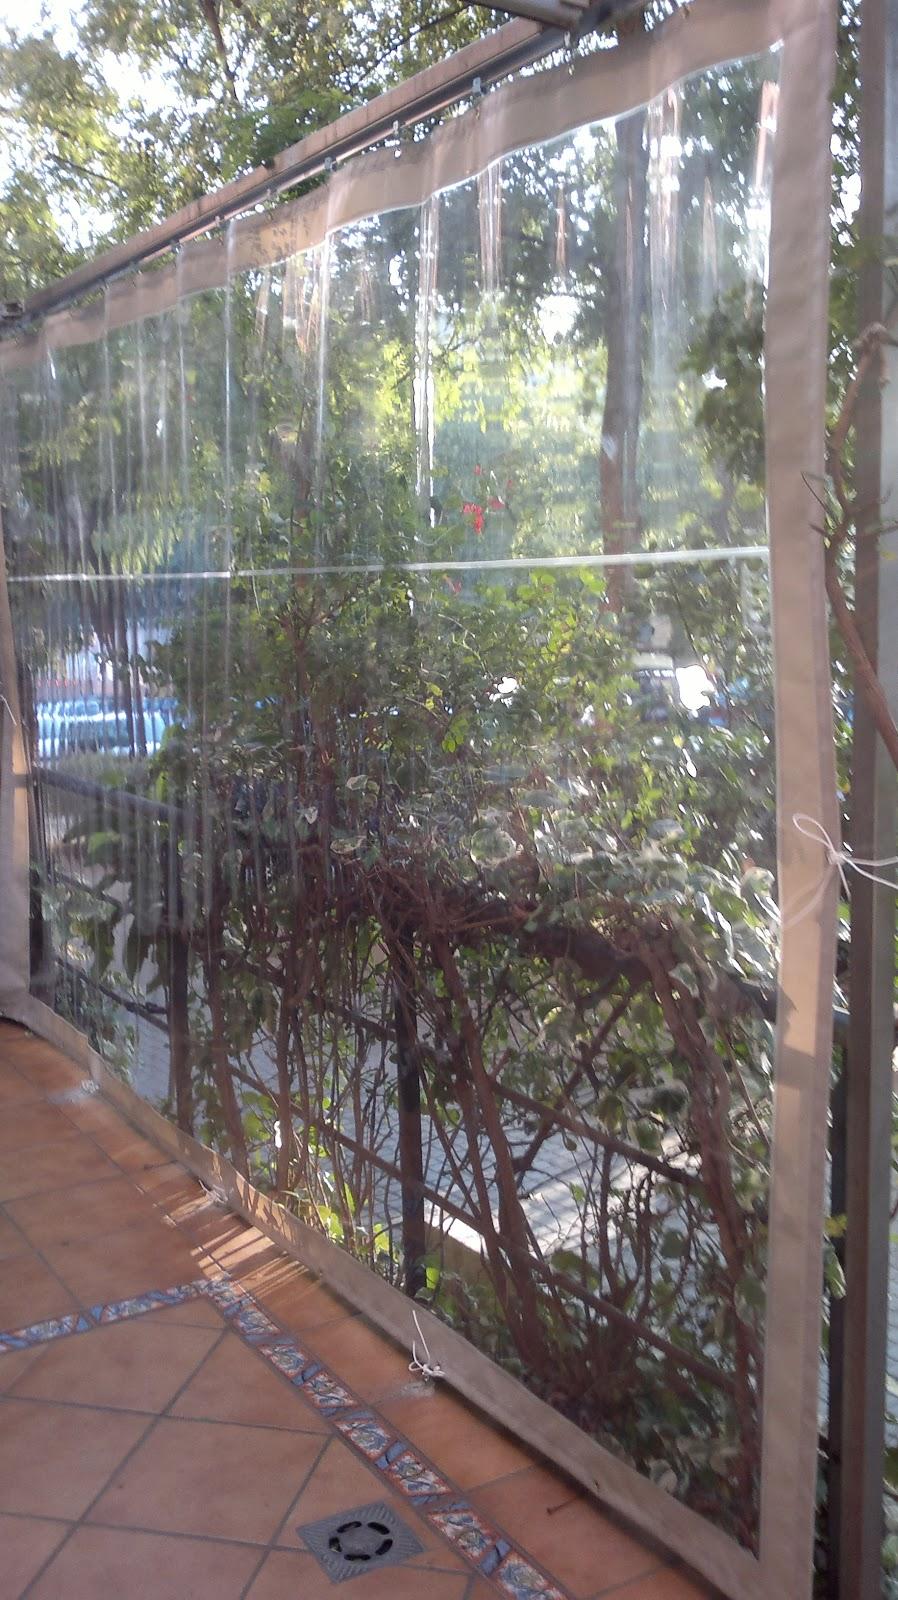 Toldos campos cerramiento terraza con cortina pvc - Cerramientos de pvc para terrazas ...